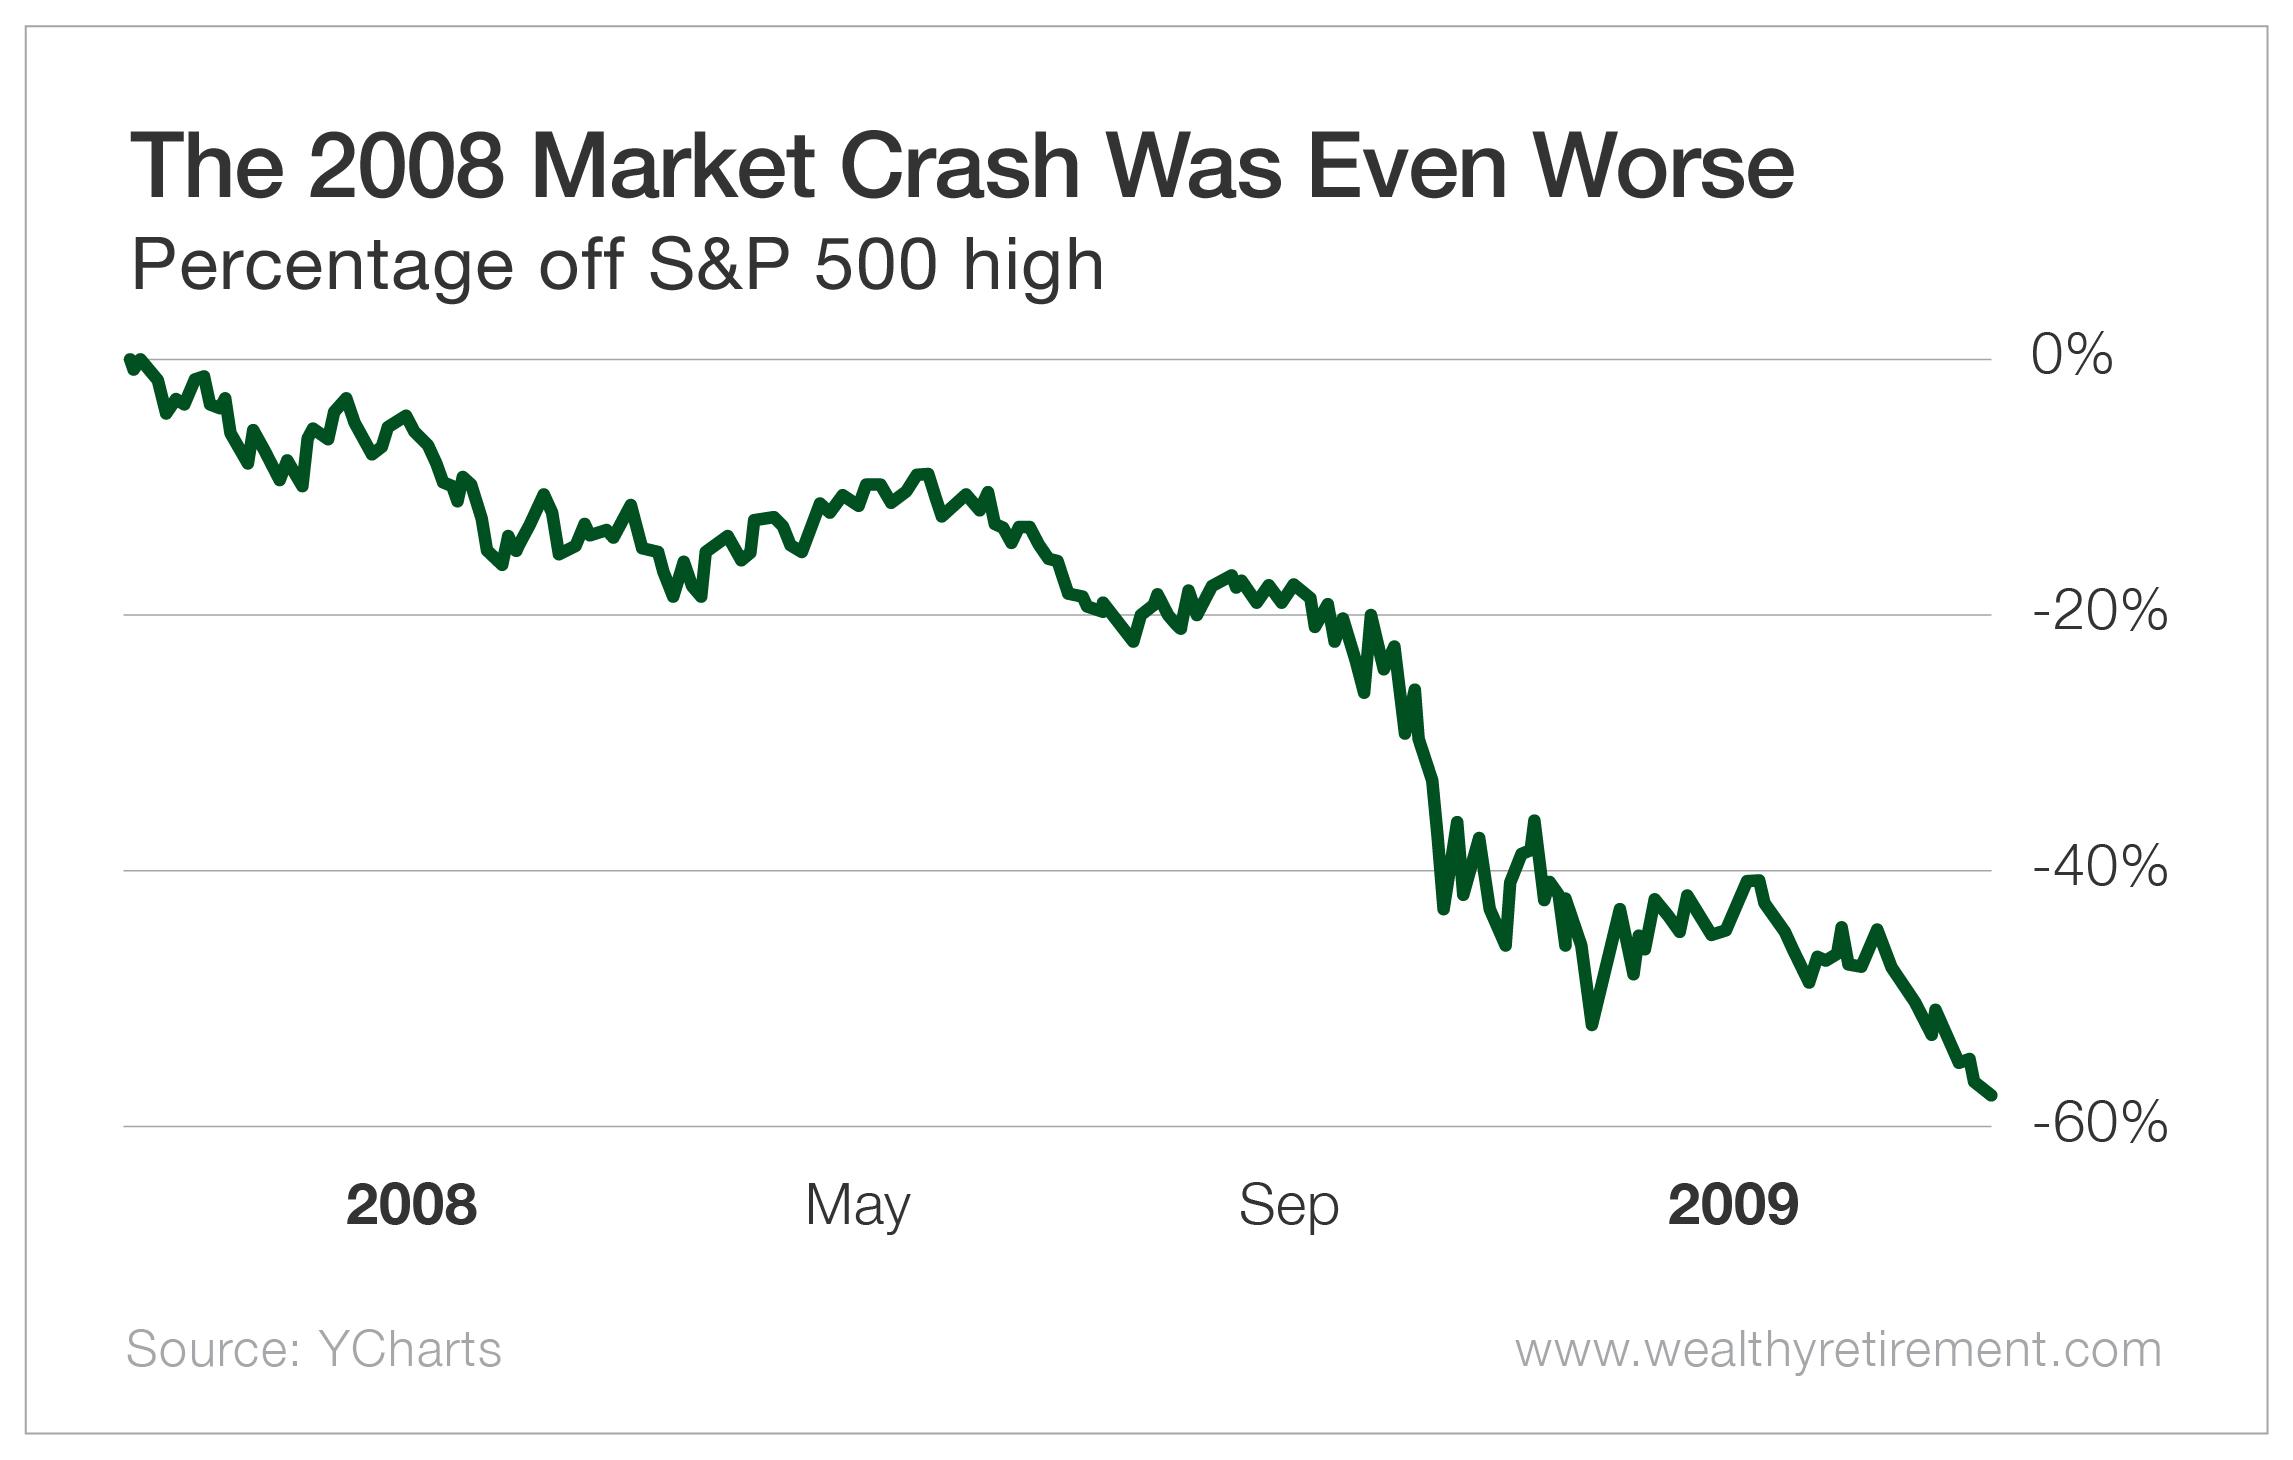 The 2008 Market Crash Was Even Worse